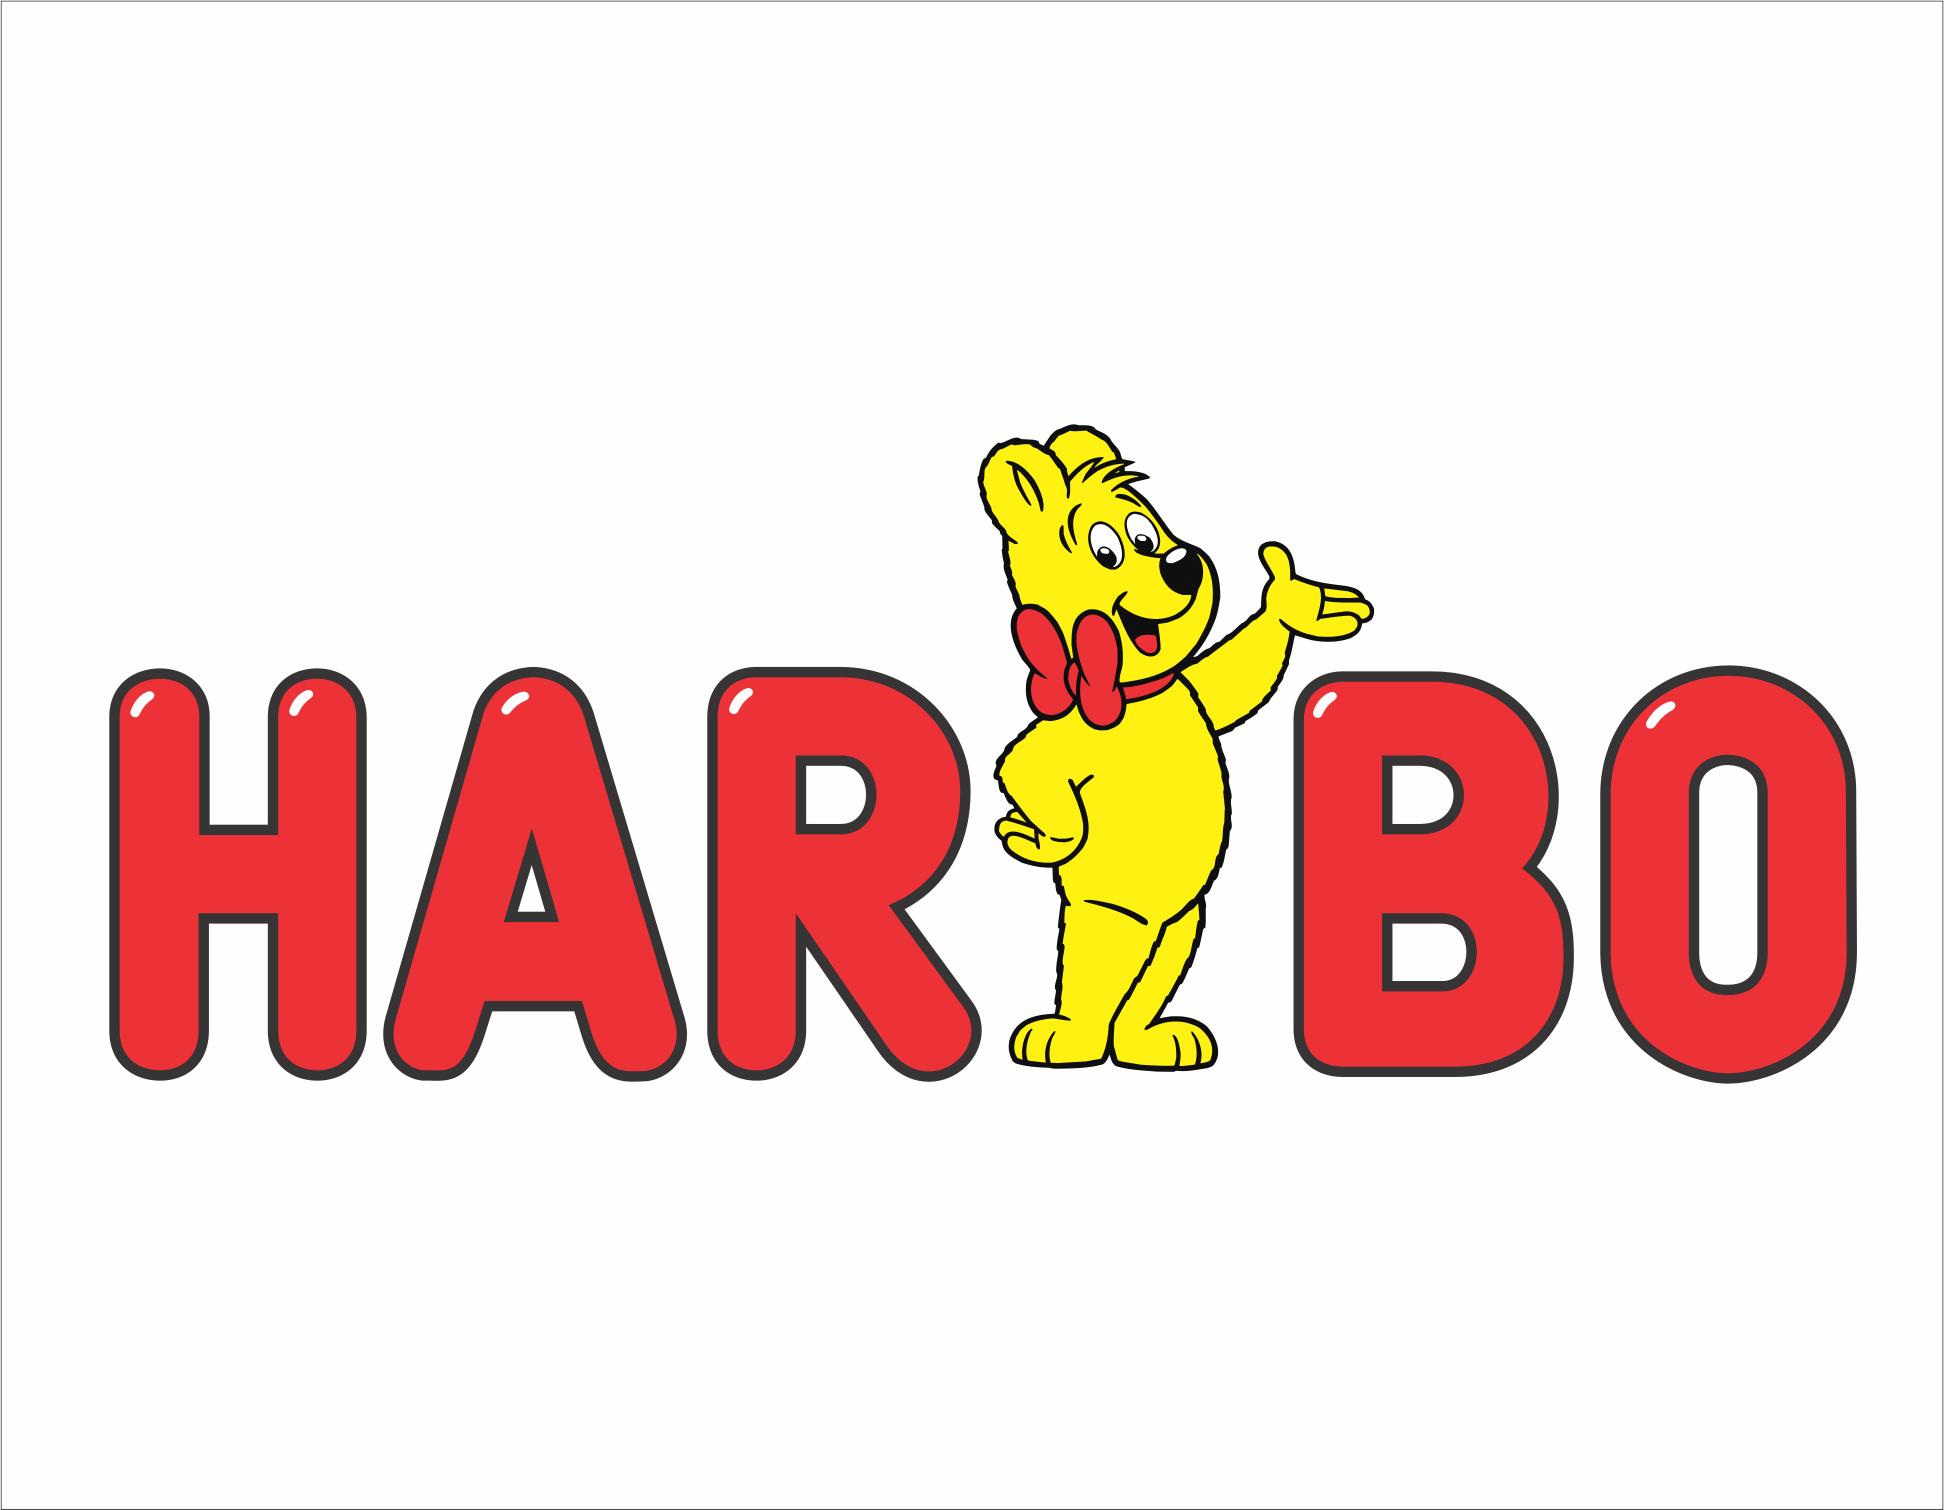 Haribo Logo Vector - Sinopec Vector, Transparent background PNG HD thumbnail